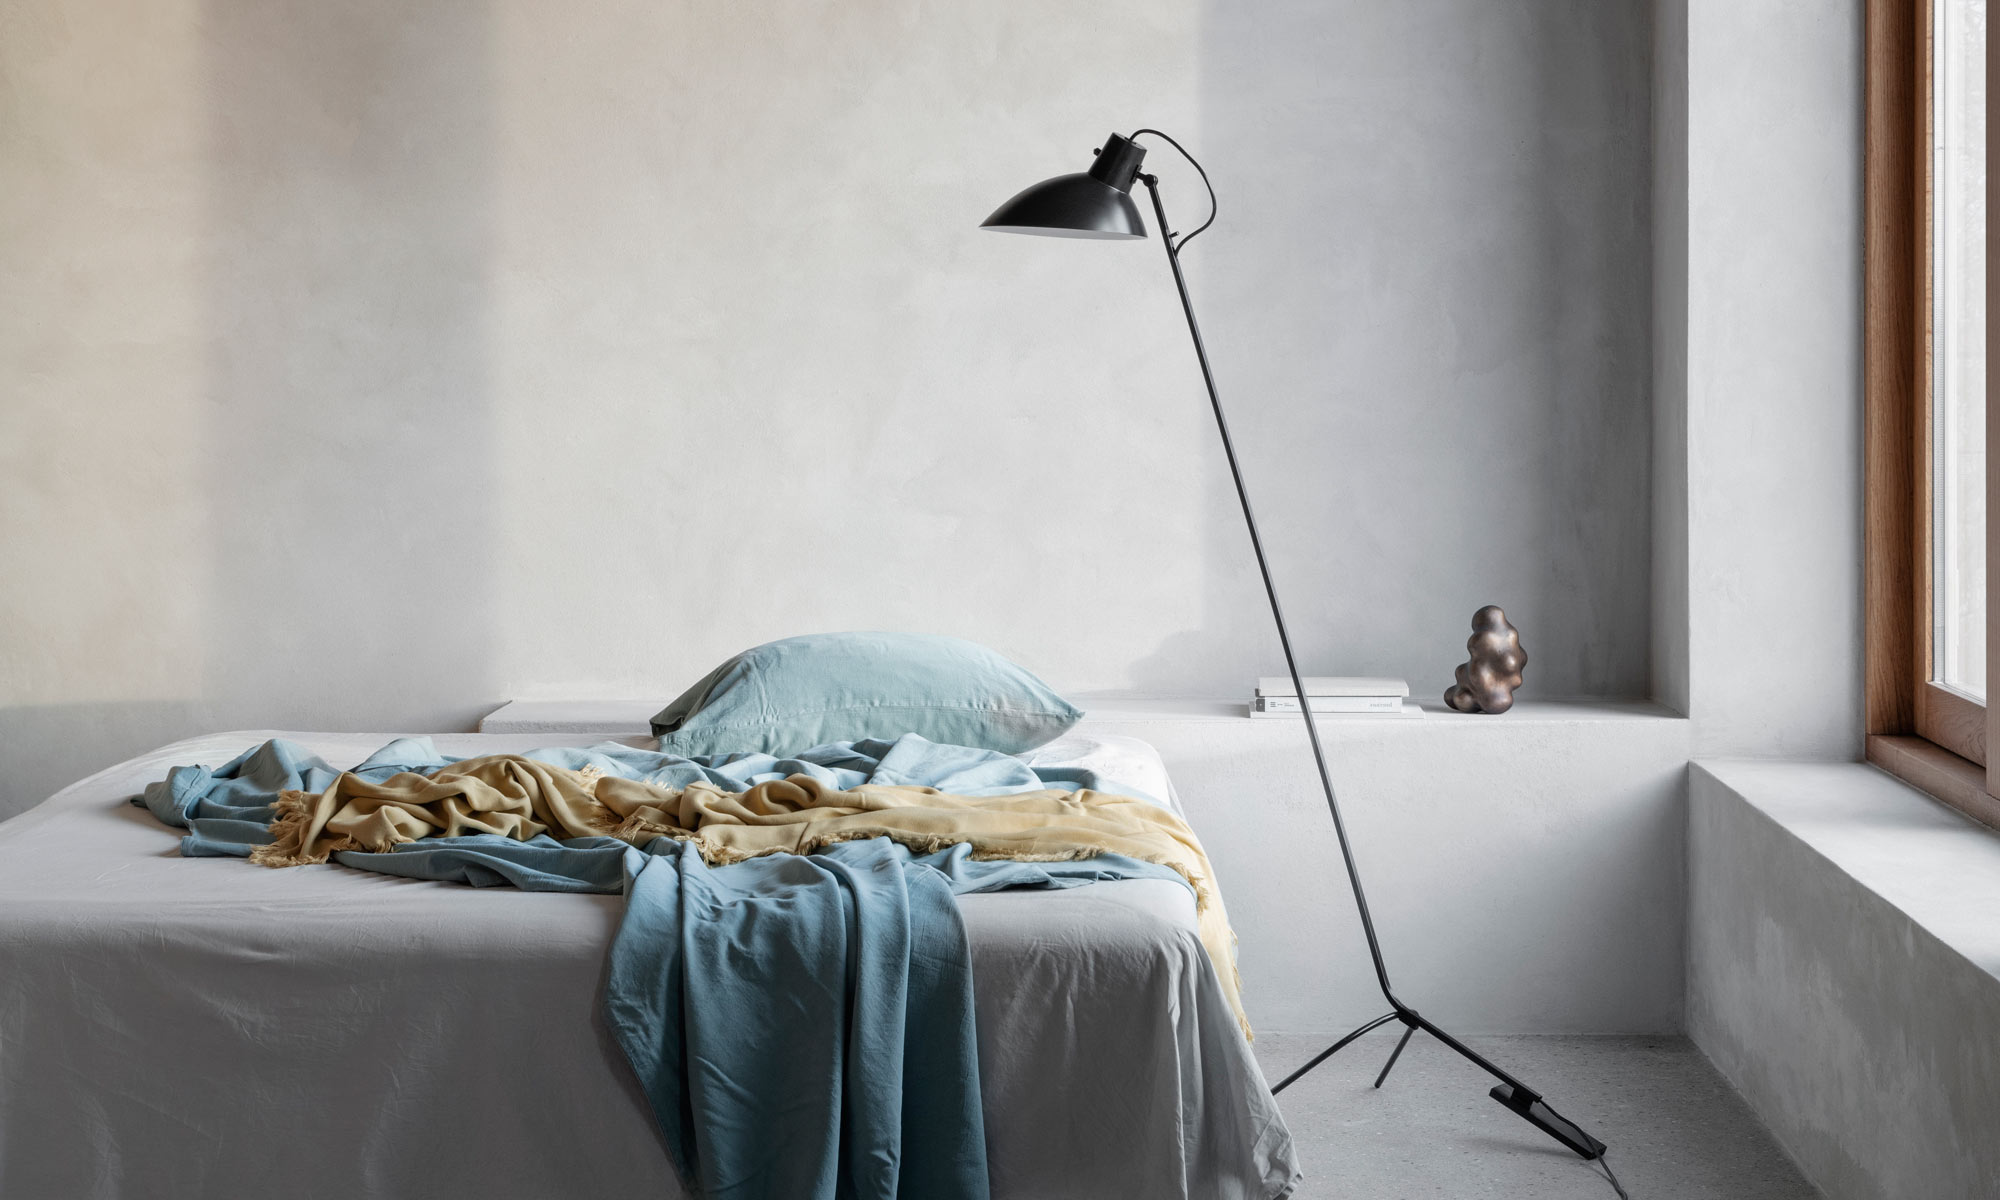 Astep 'VV Cinquanta' Floor Lamp by Vittoriano Viganò Image Credit: Astep